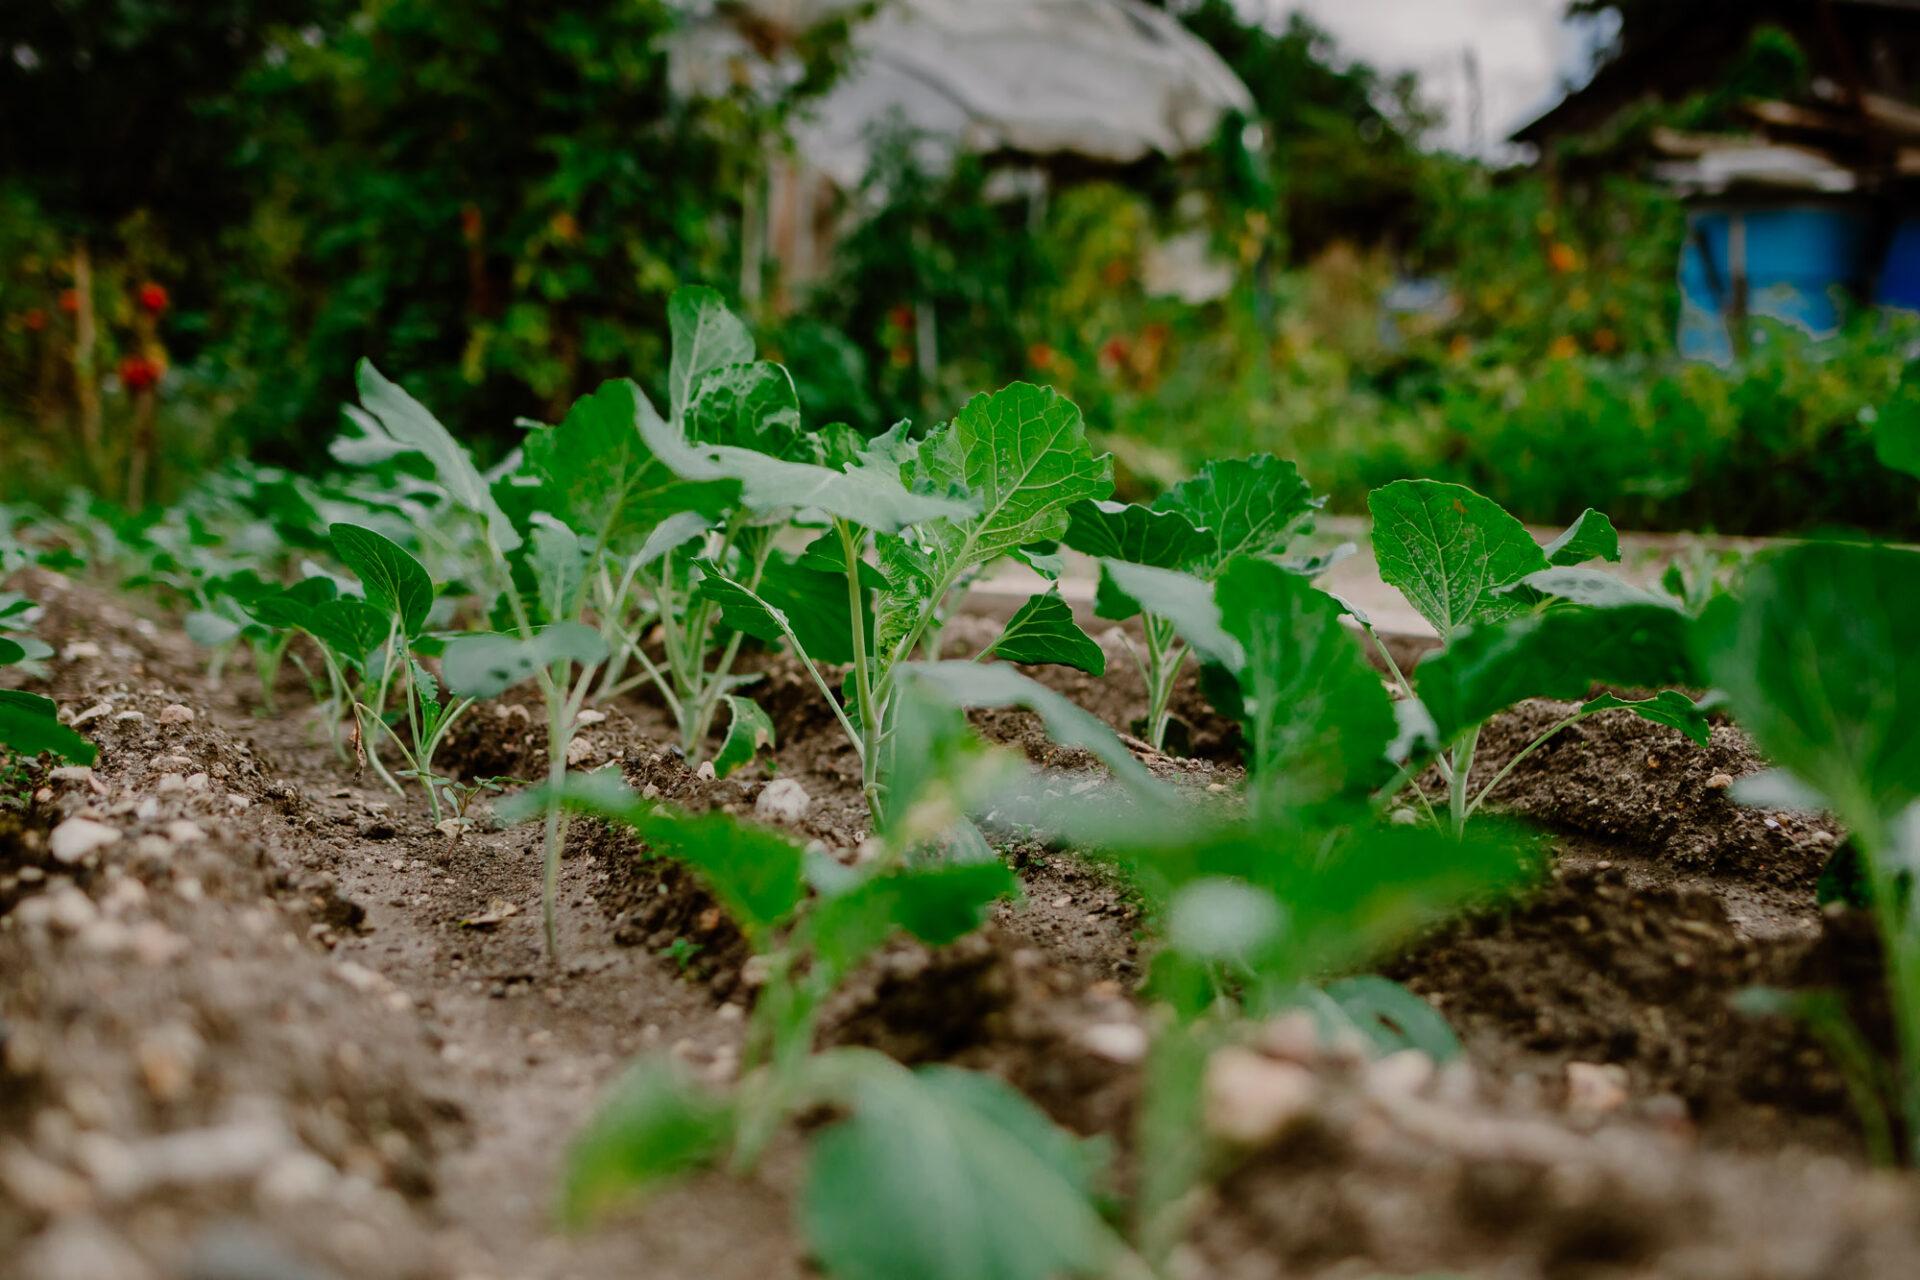 Jardins ouvriers aubervilliers 34 - Dagmara Bojenko - Eco-conscious Weddings, Births & Families